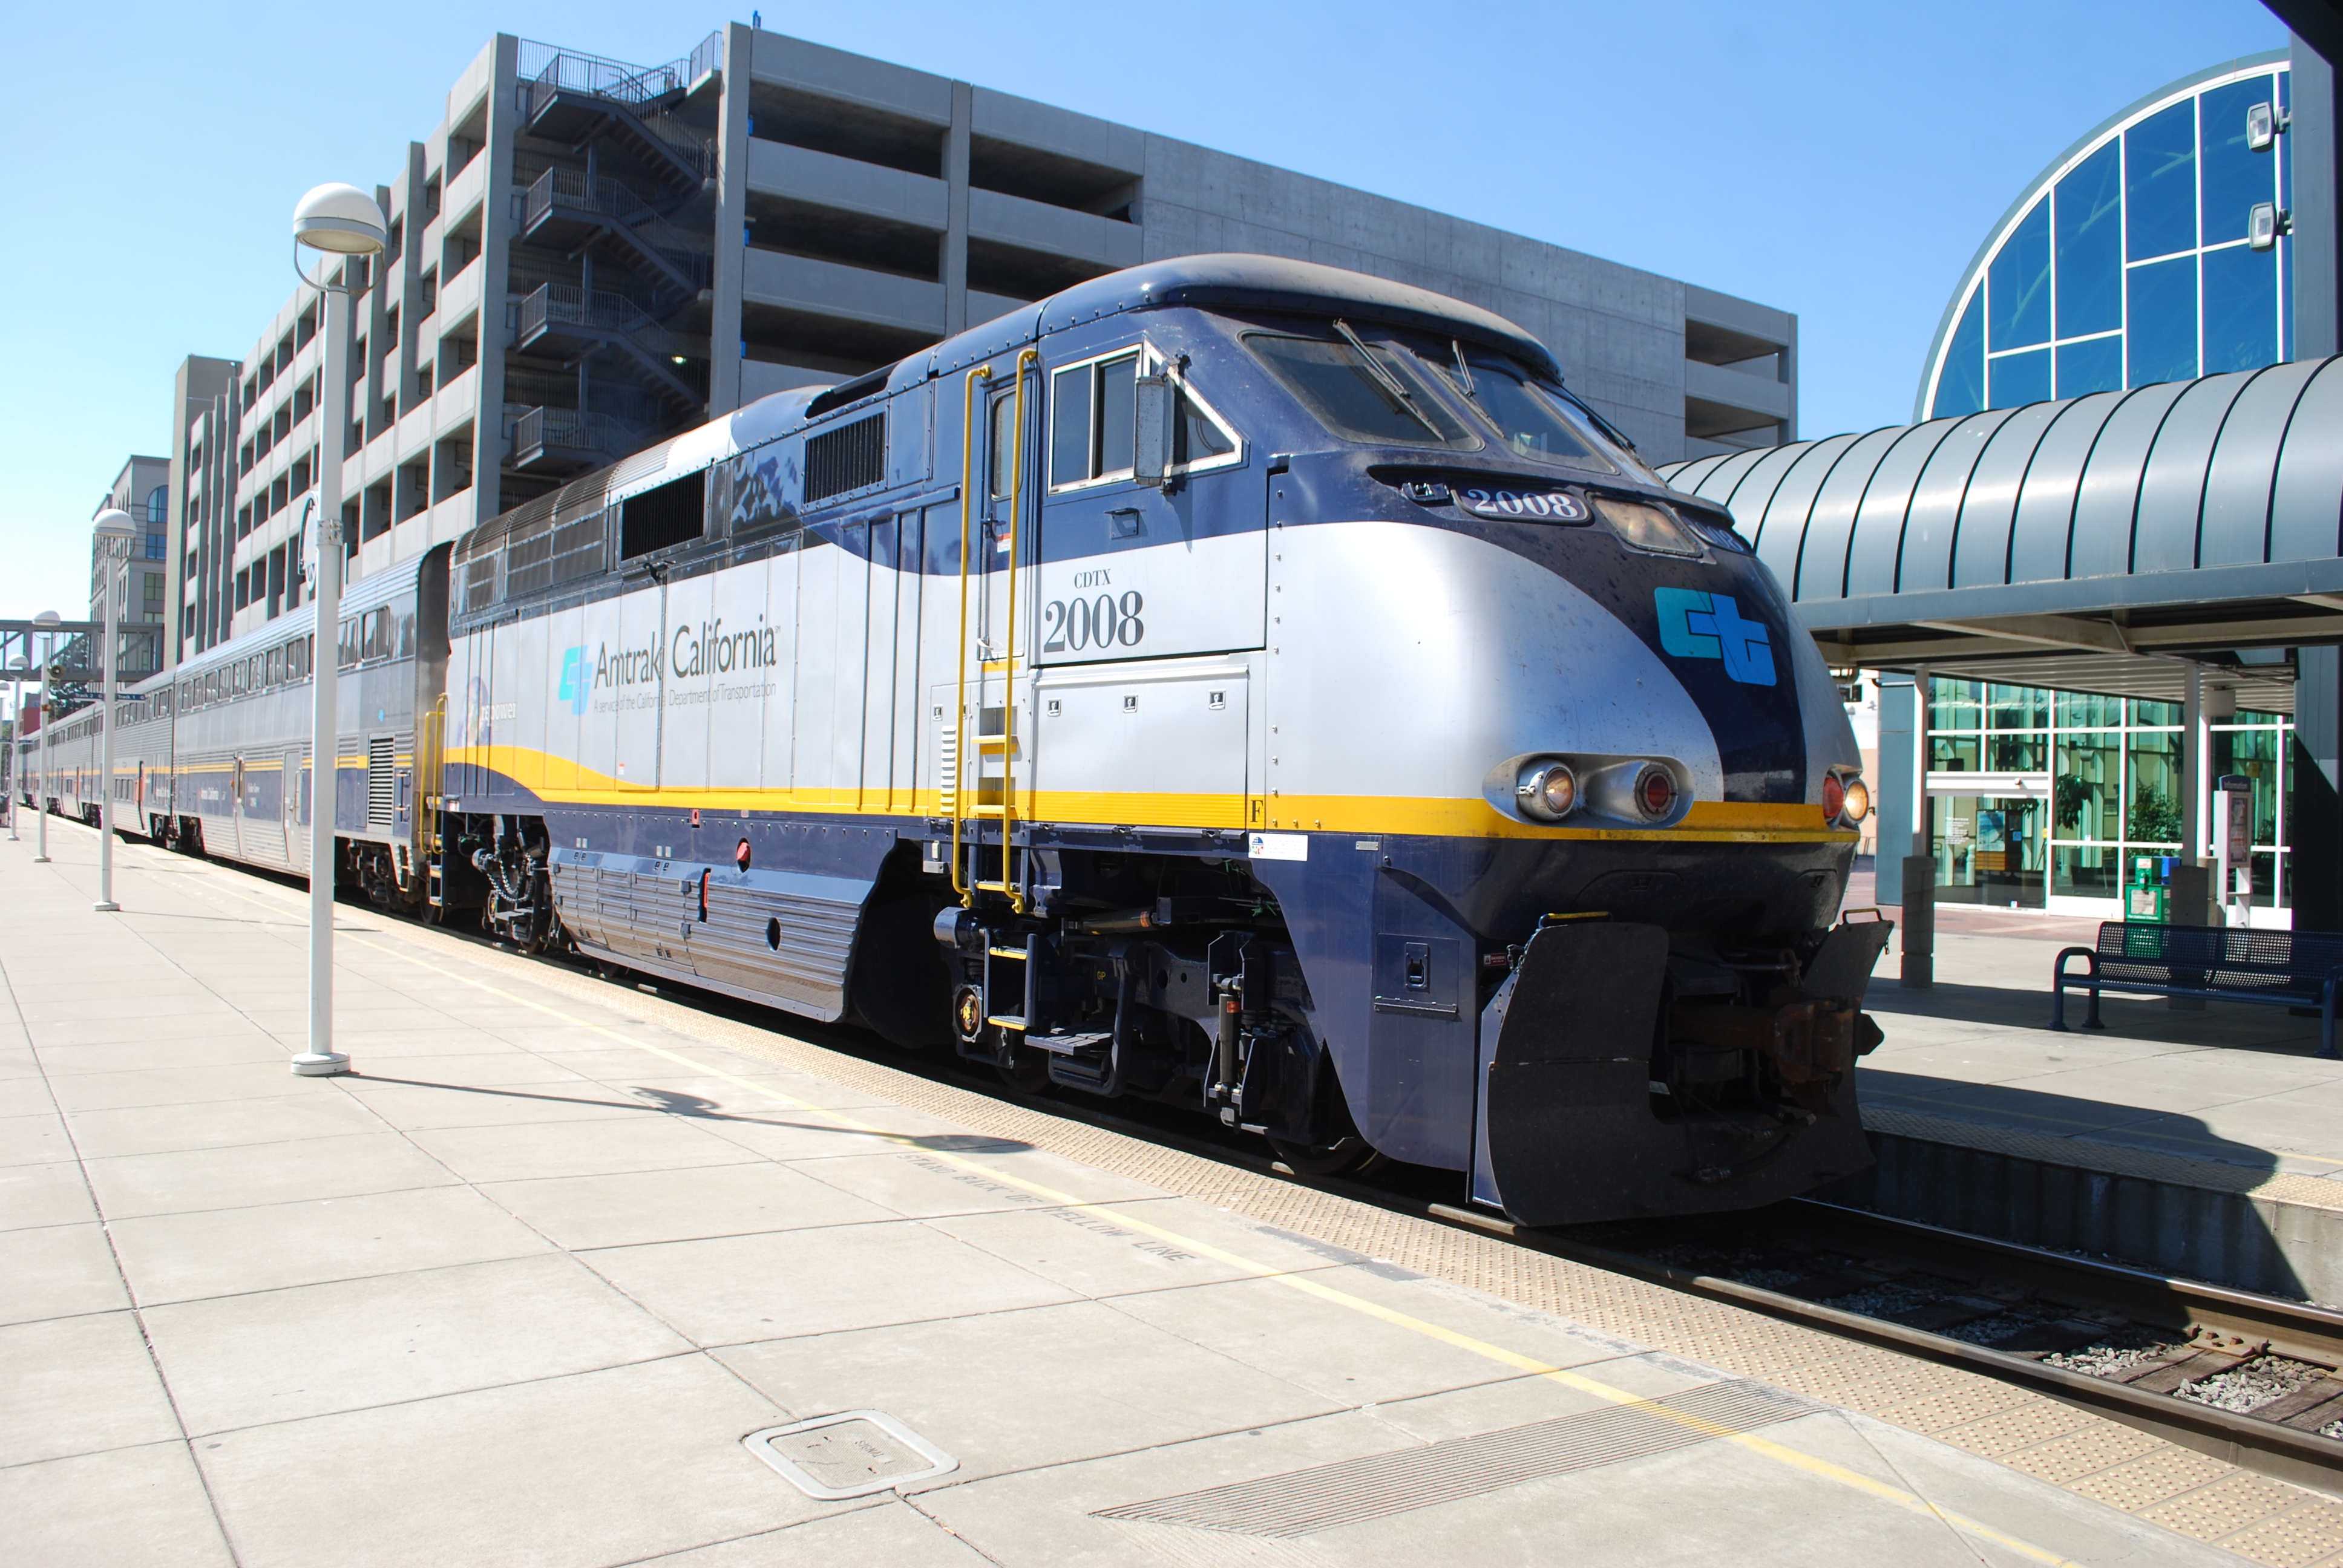 Amtrak train inside amtrak fares and schedules tickets view original